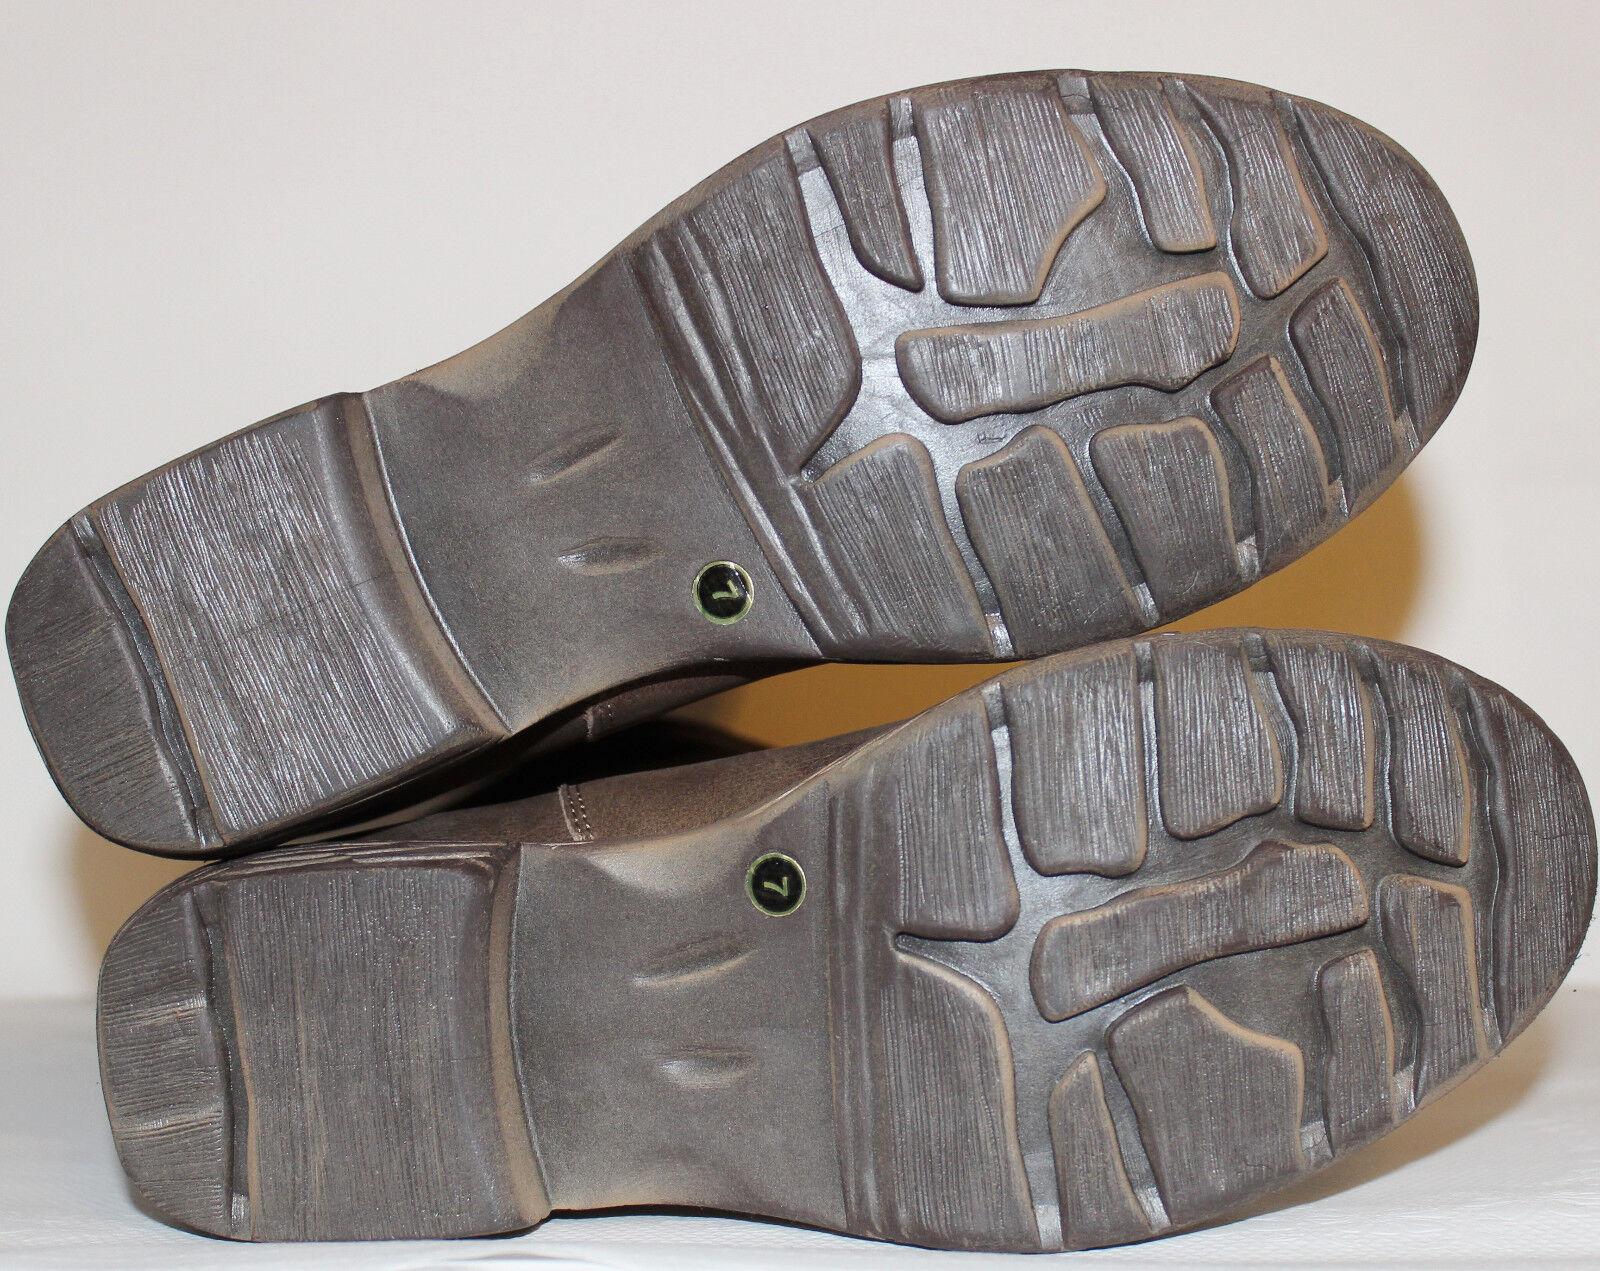 ✿STEVEN Steve Madden Madeira Antiqued Premium M Leder Zip Stiefel 7 M Premium NEW  L@@K C4 304efb